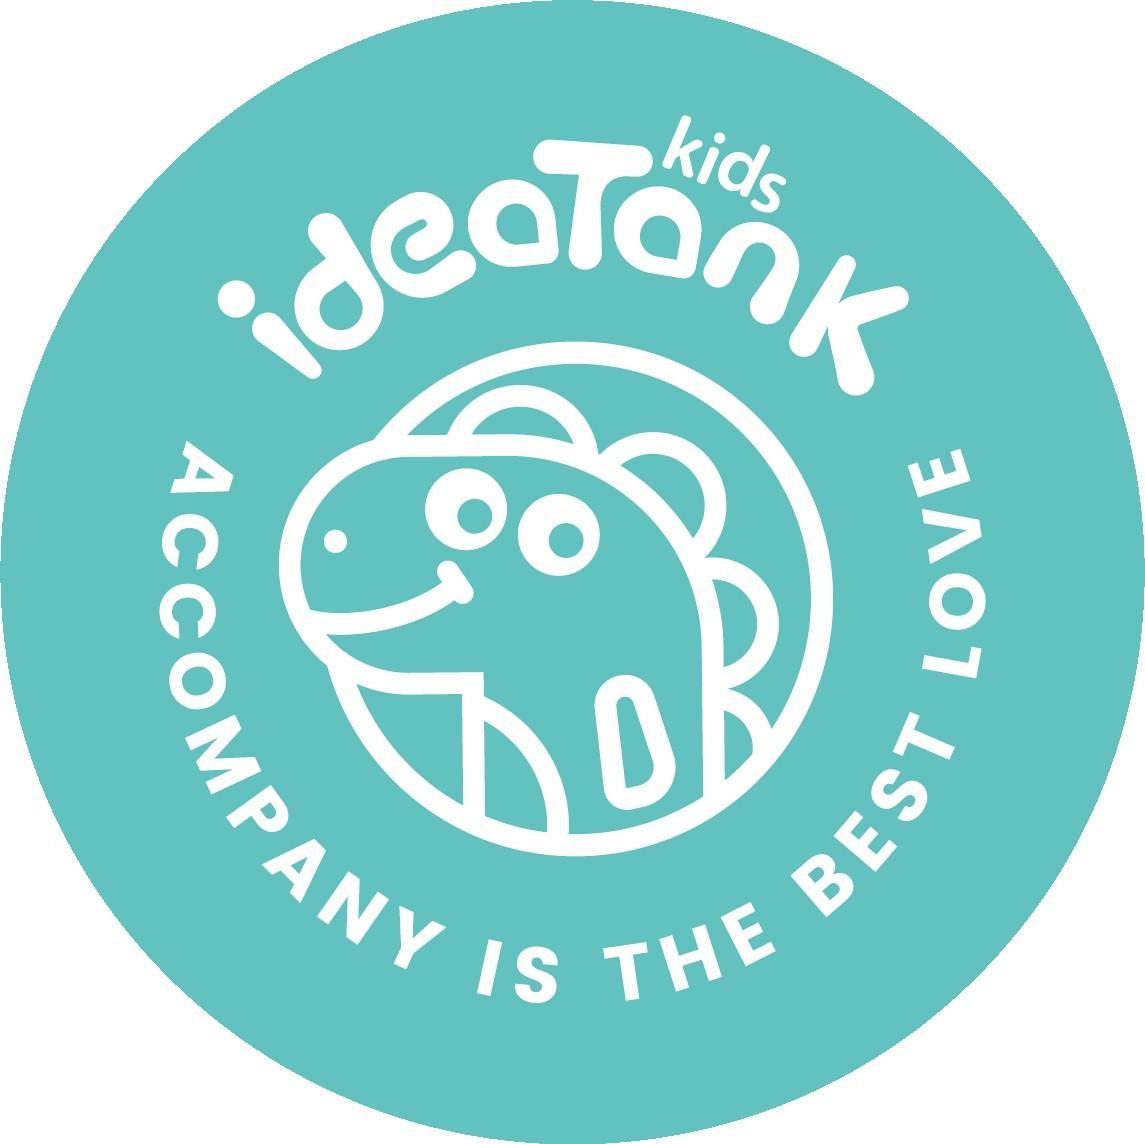 ideaTank恐龙爱迪经典营销方案让投资者一年多赚50万!